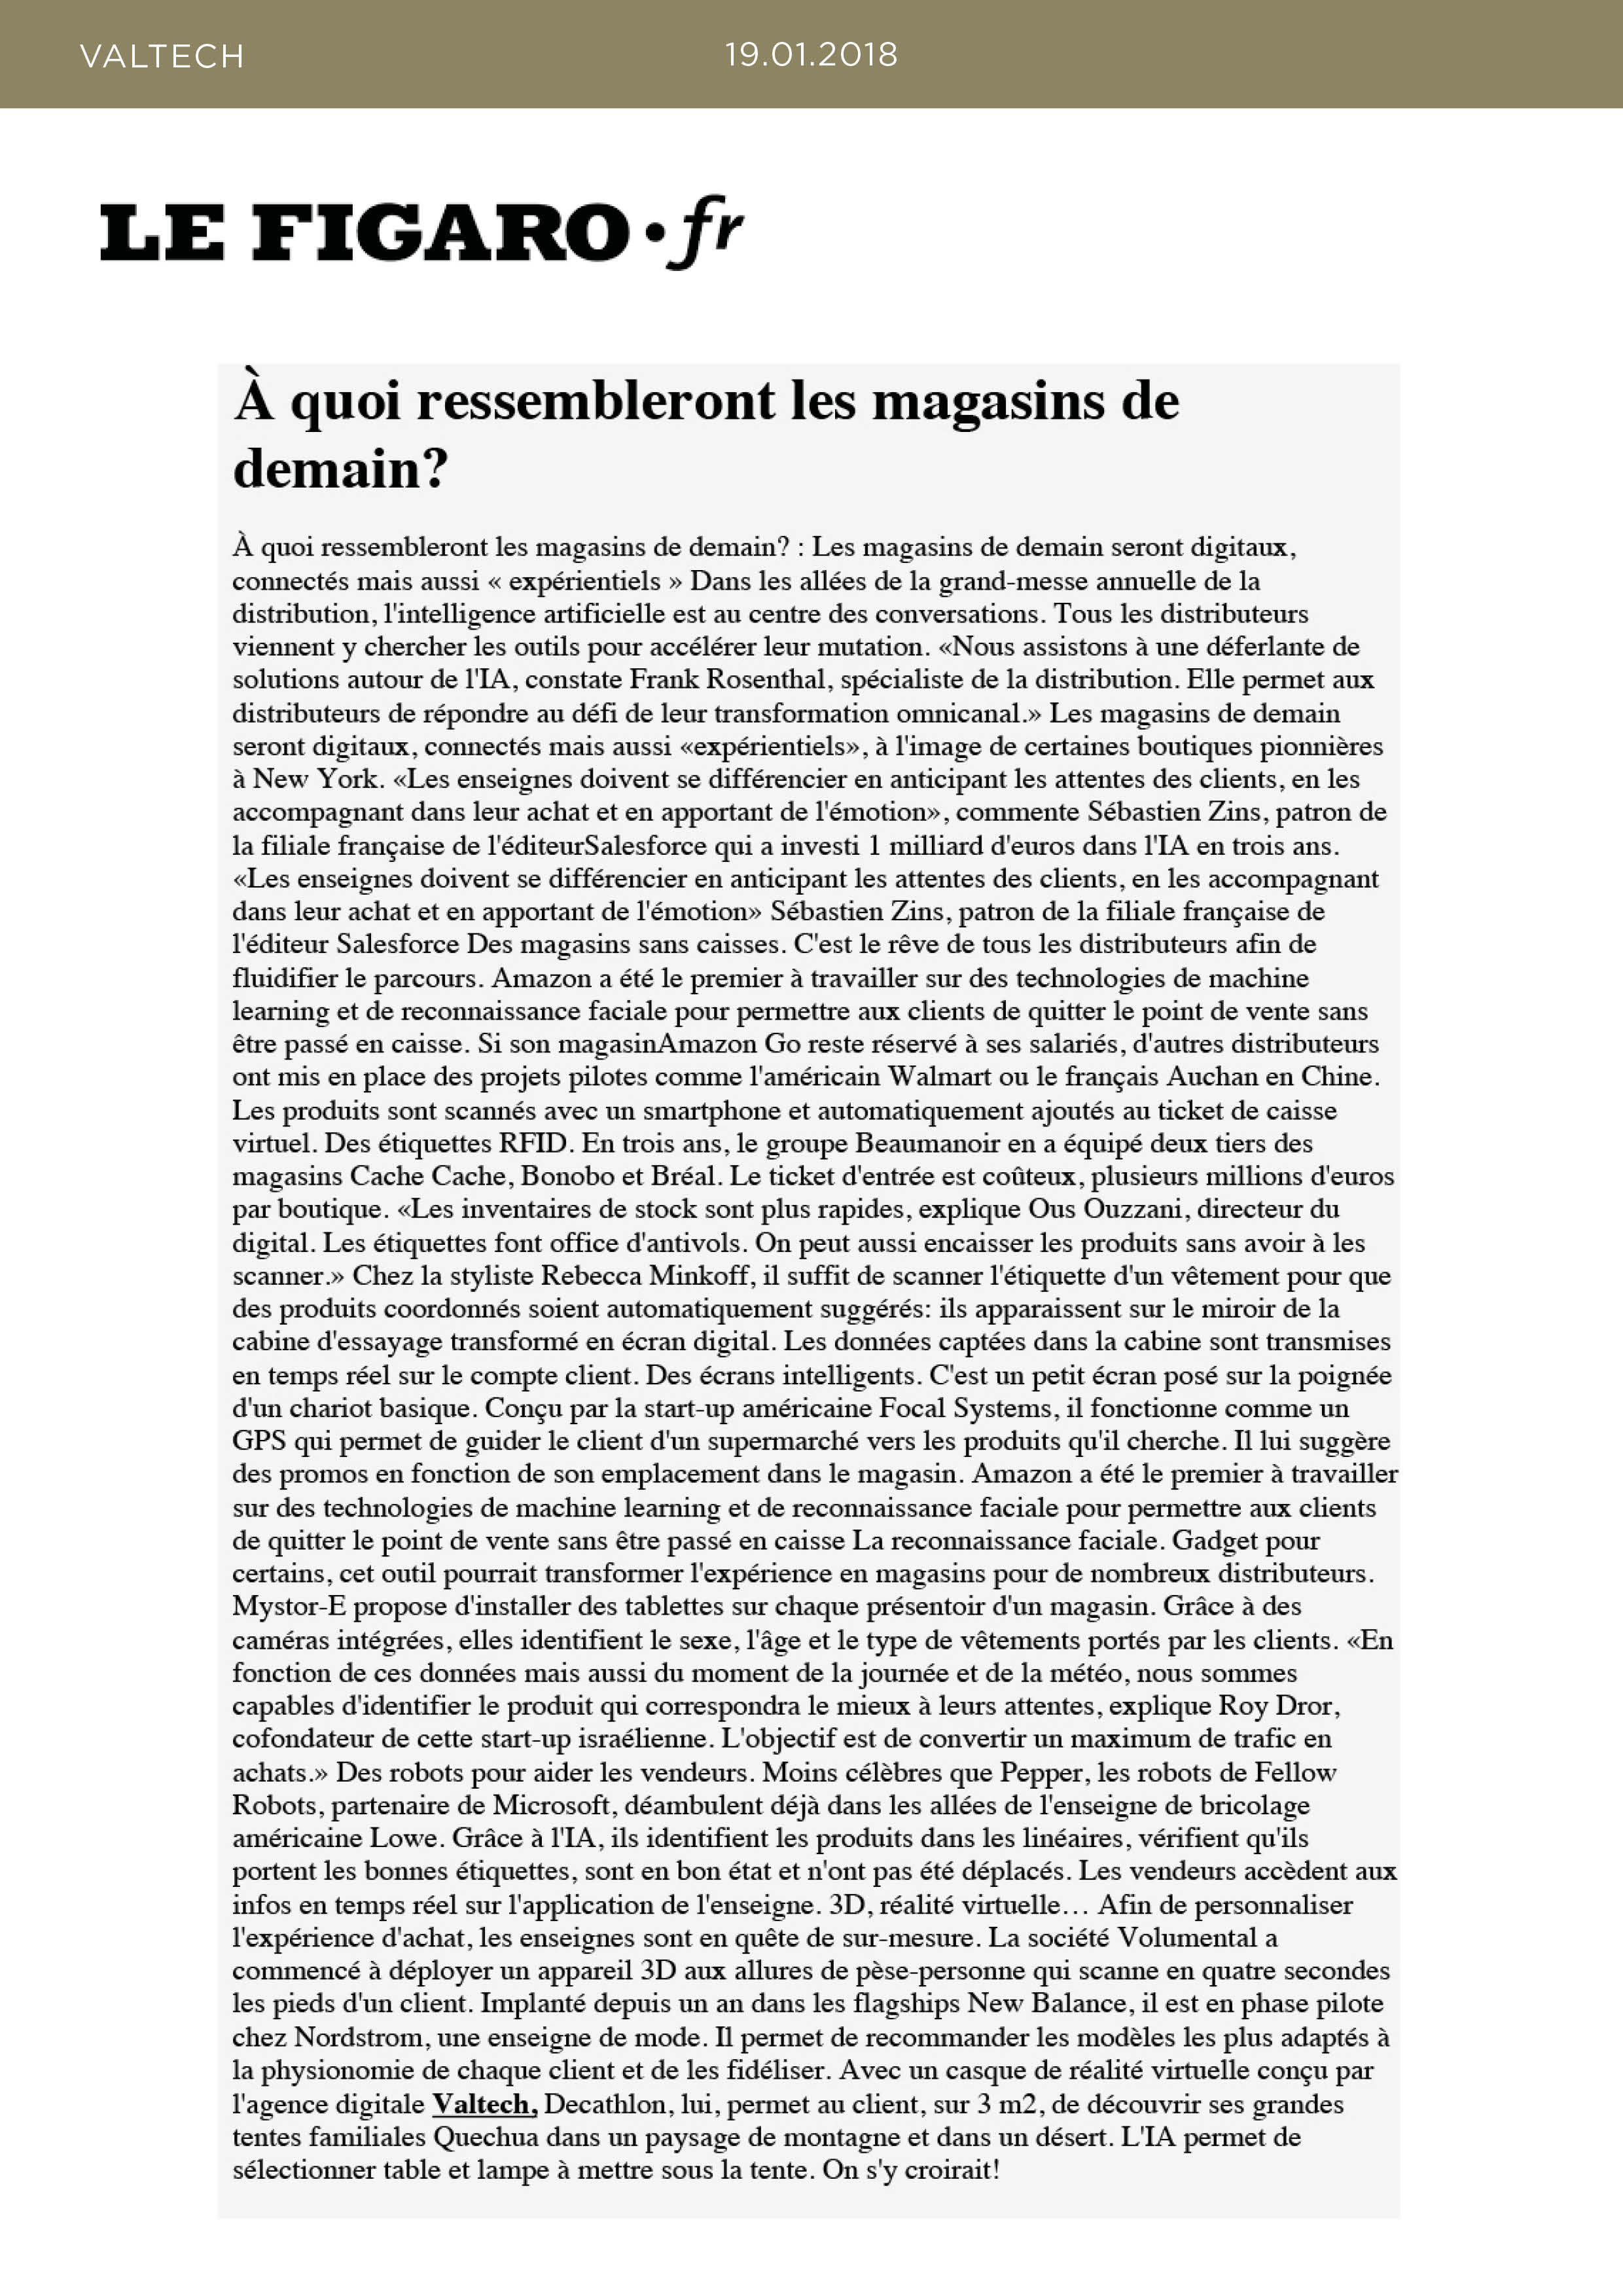 BOOKMEDIA_JANV_WEB36.jpg